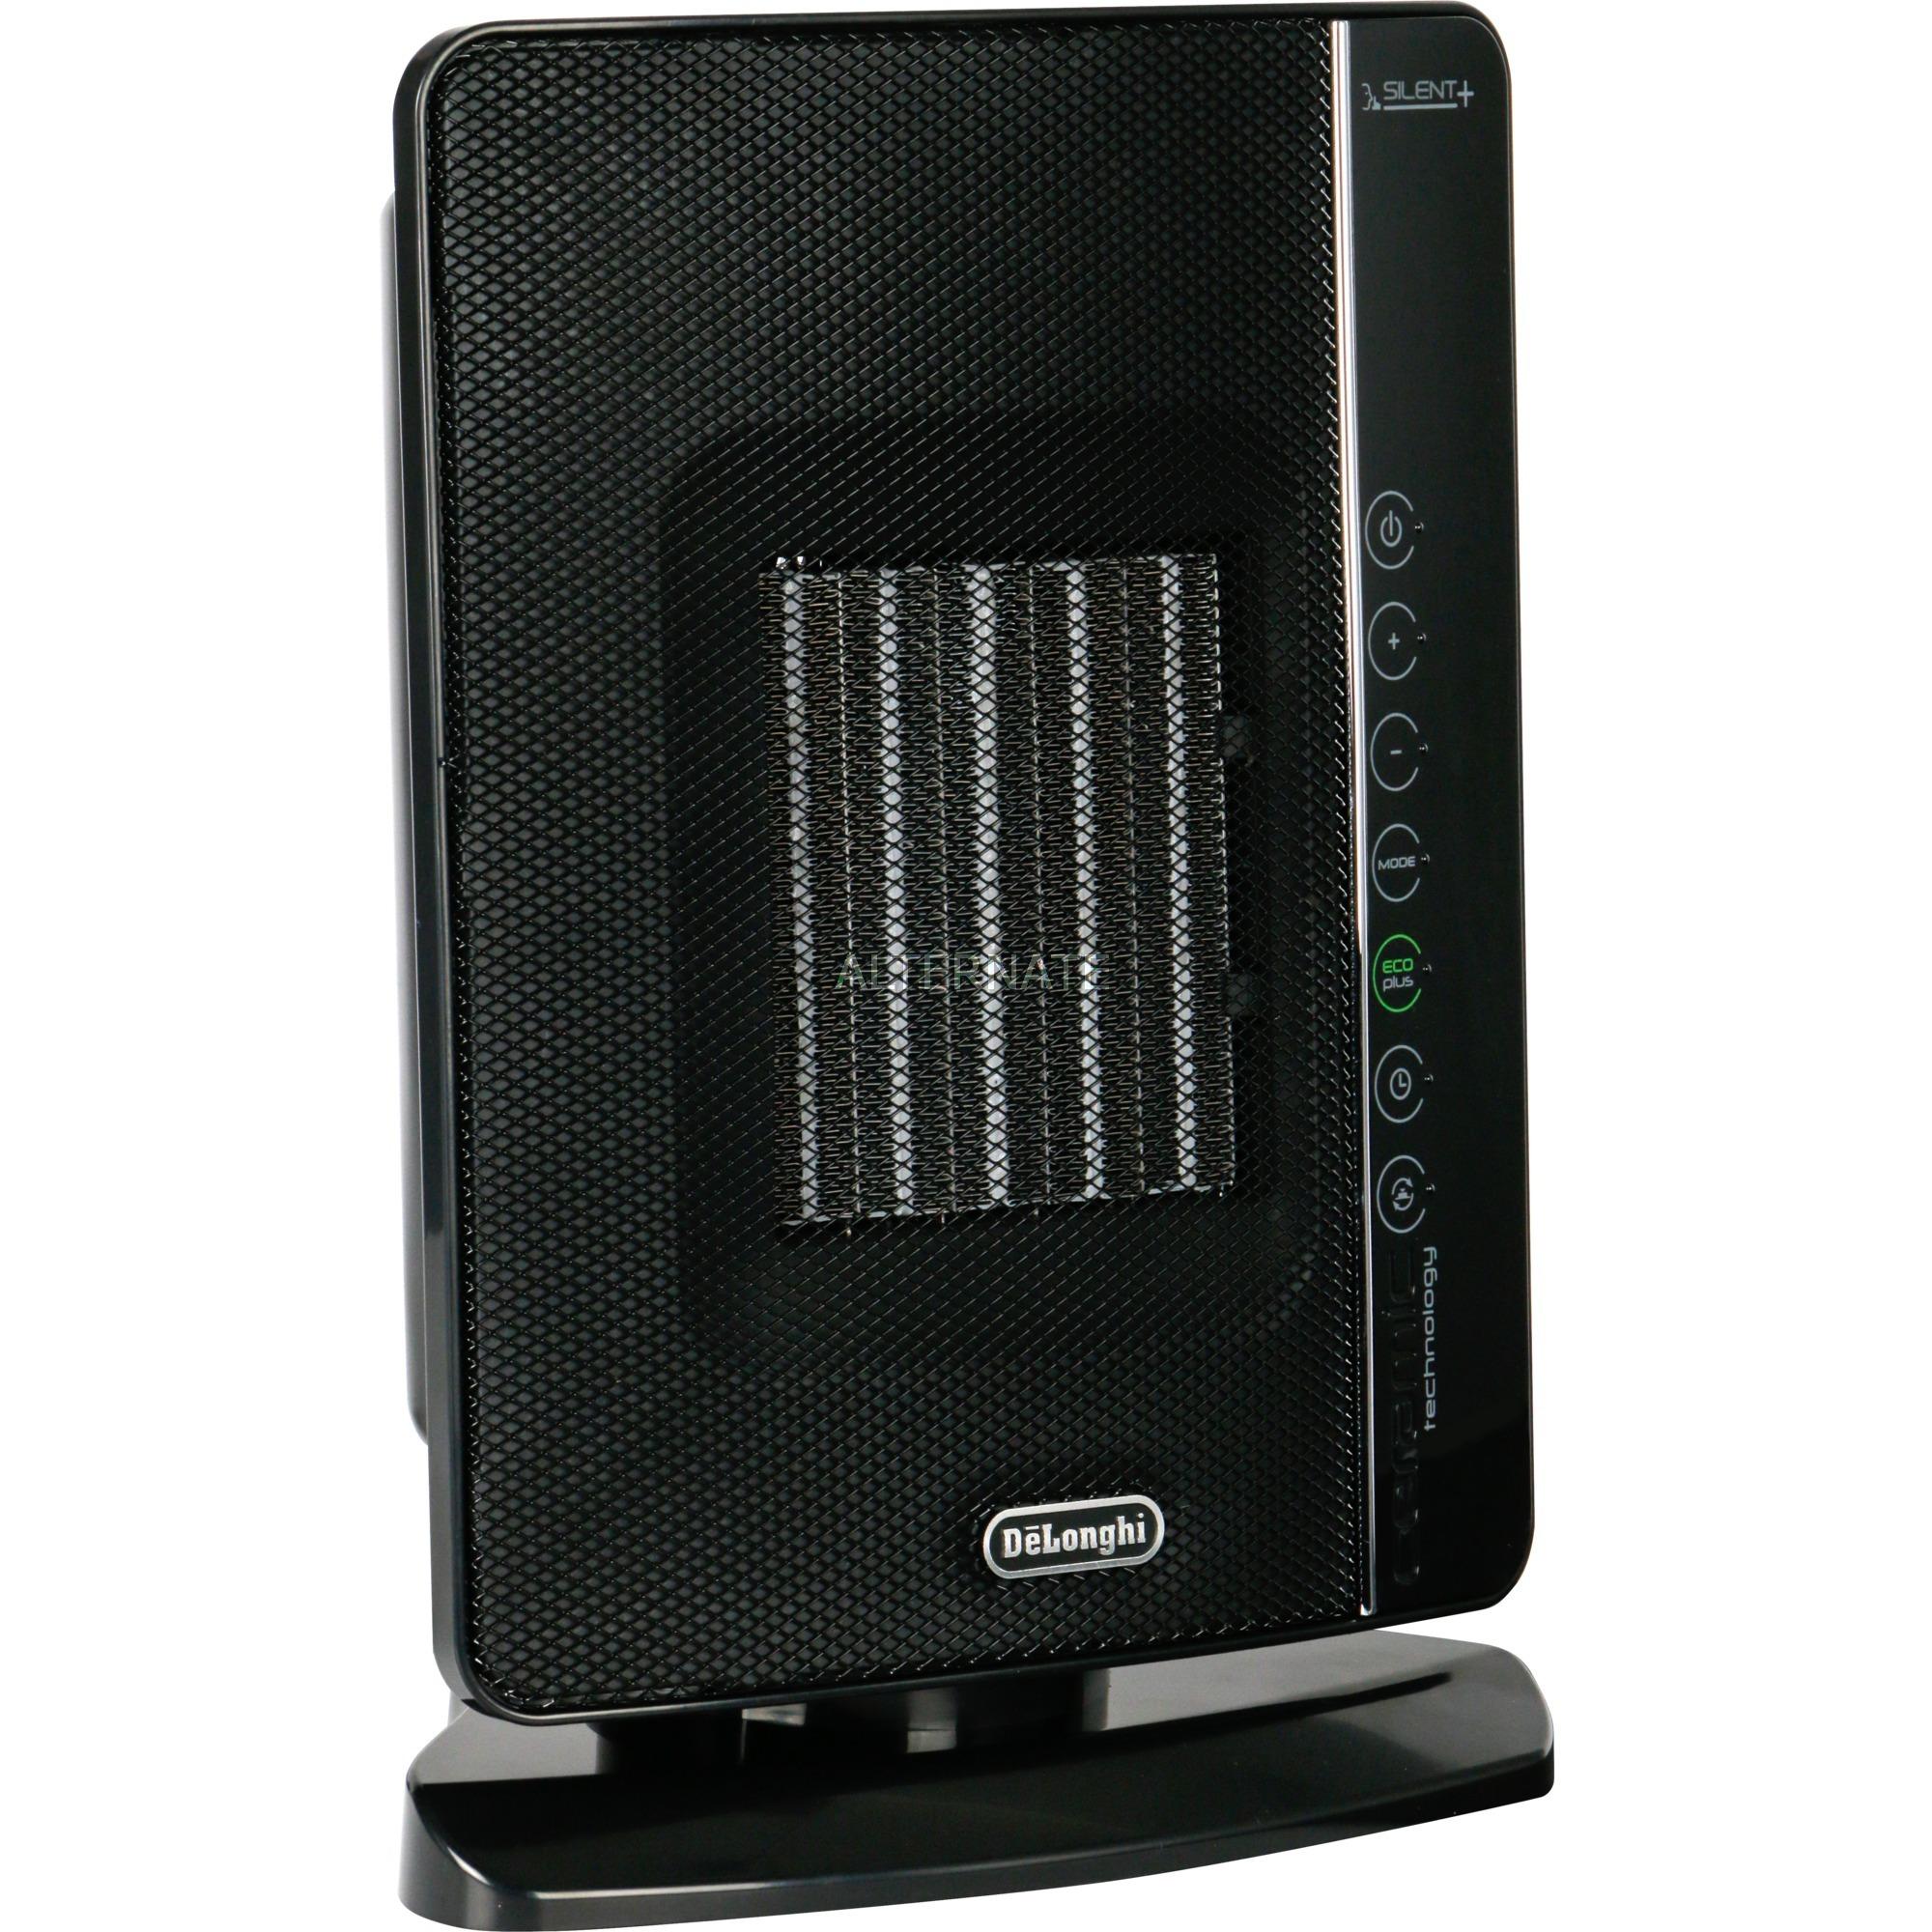 DCH7993ER.BC Interior Negro 2400W Calentador eléctrico de ventilador, Termoventiladores